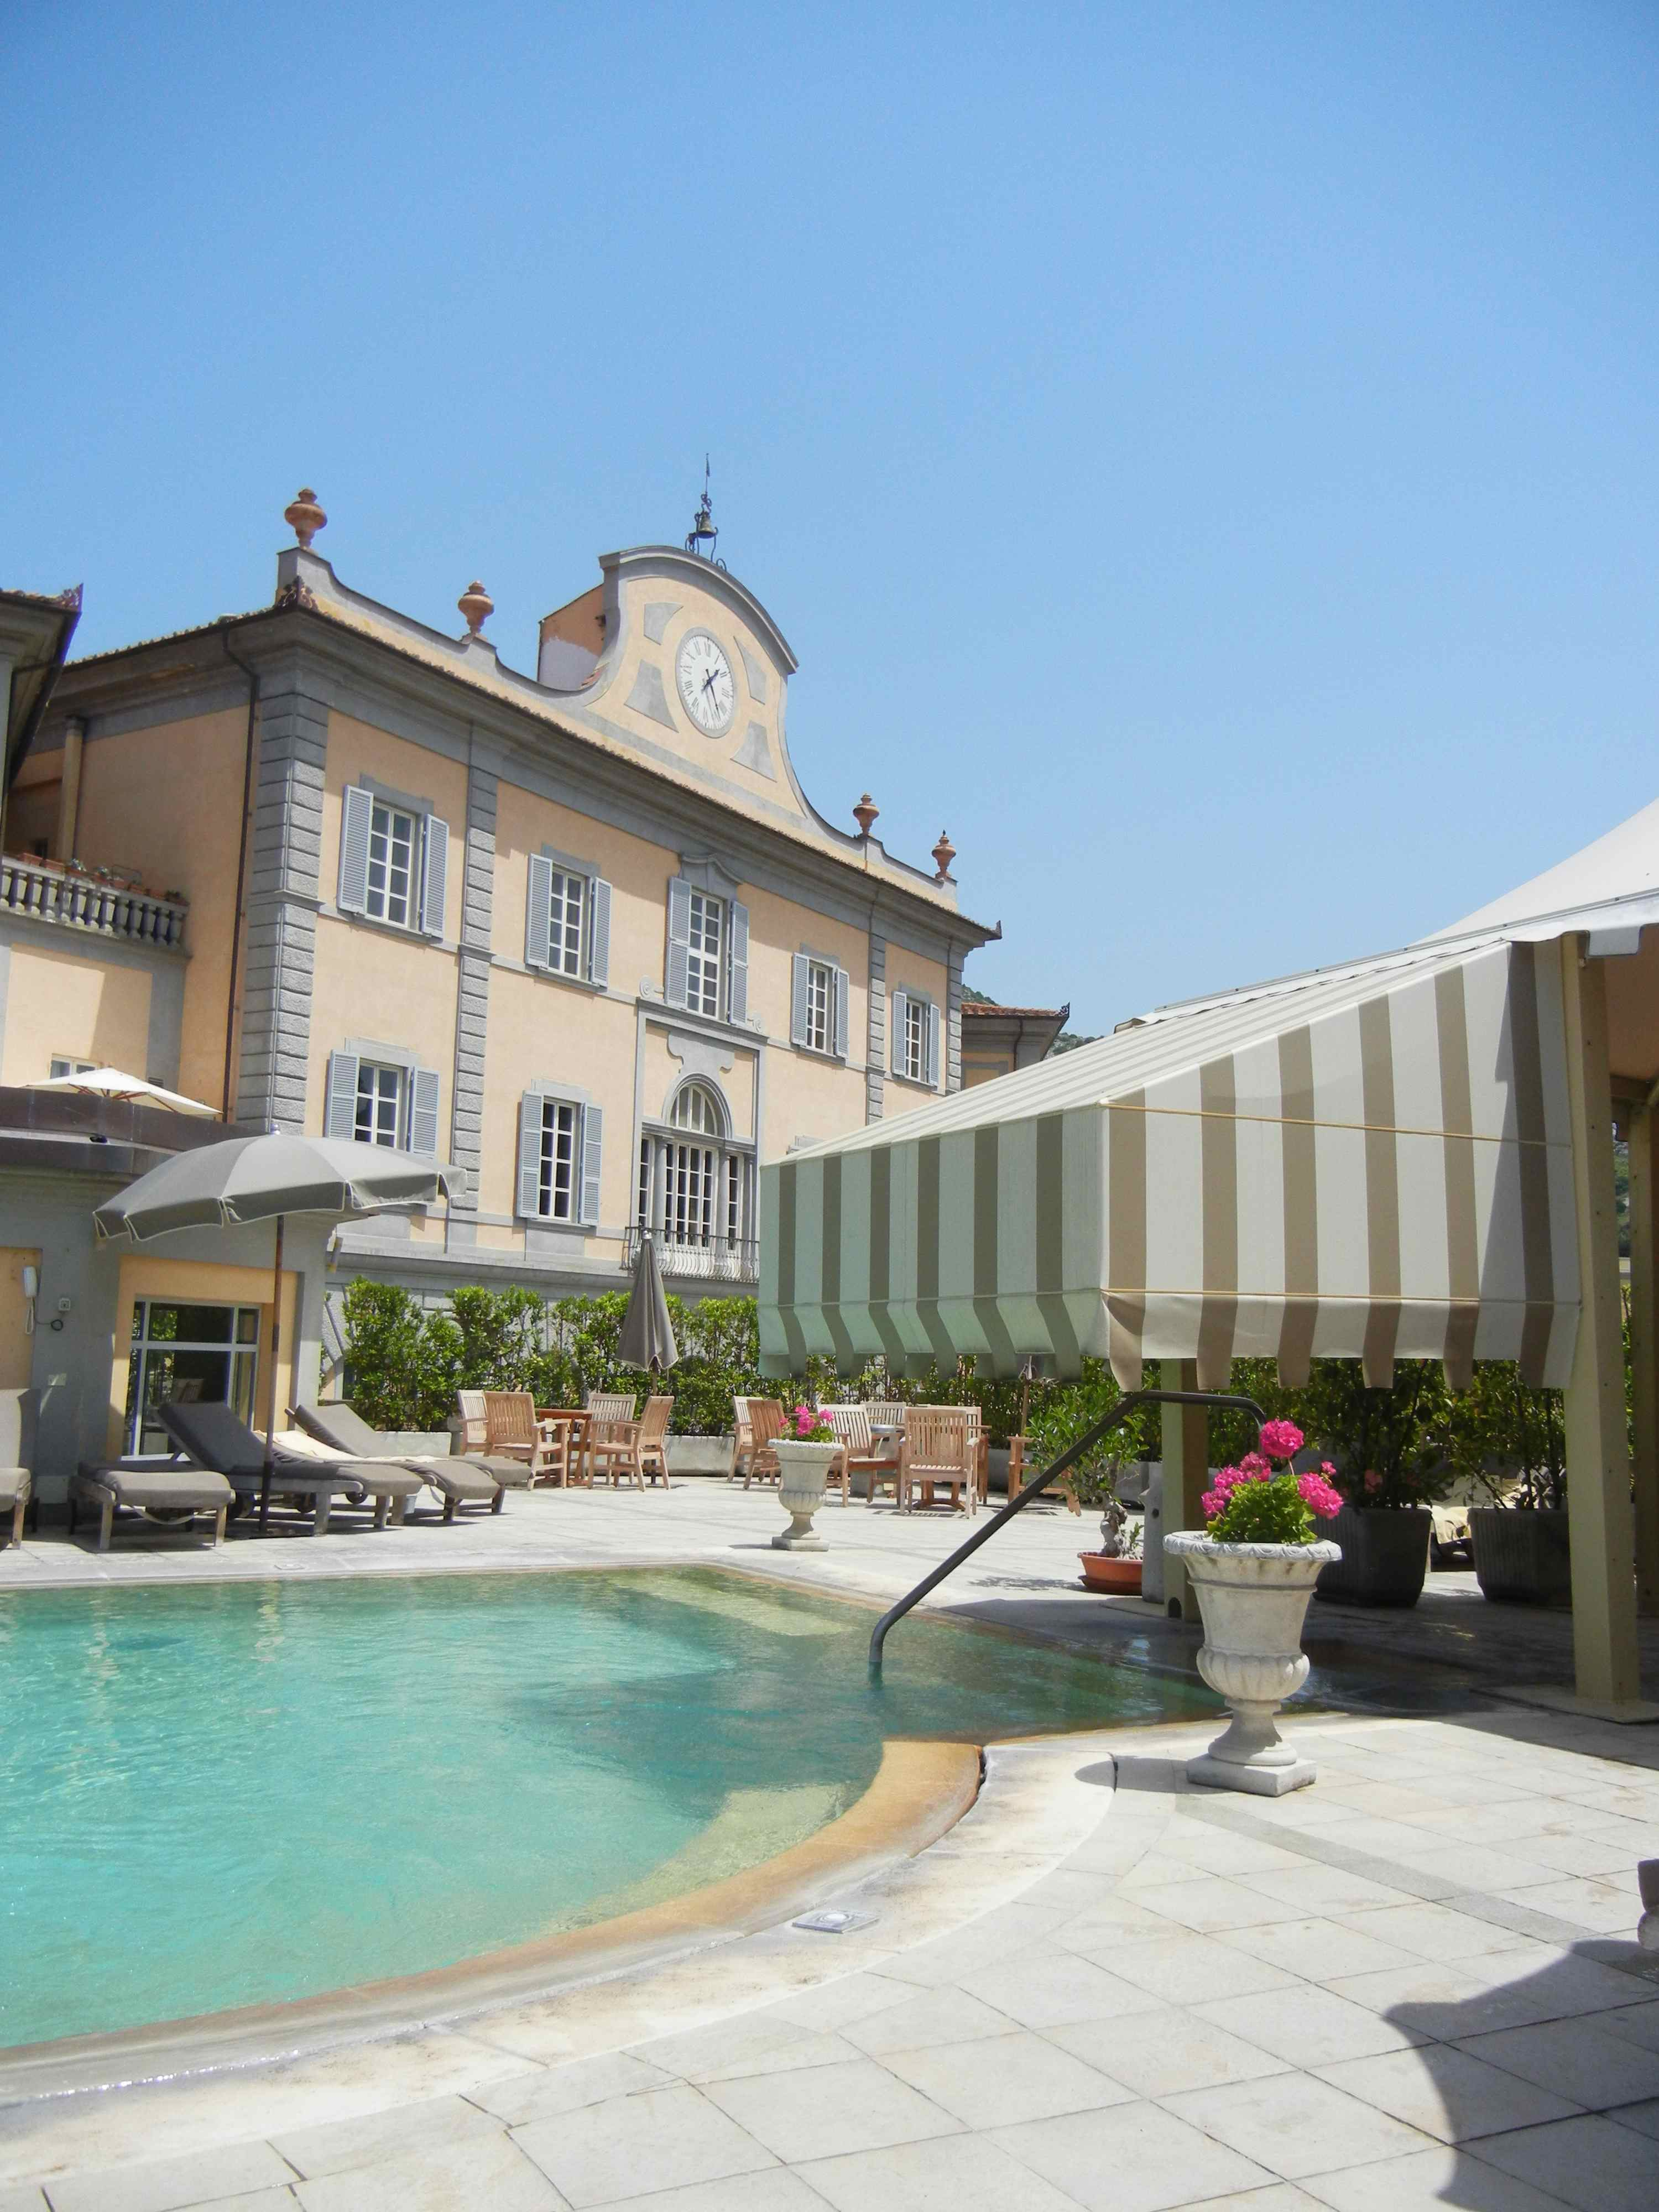 http://www.ioamoiviaggi.it/wp-content/uploads/2012/06/piscina-esterna-bagni-di-pisa.jpg